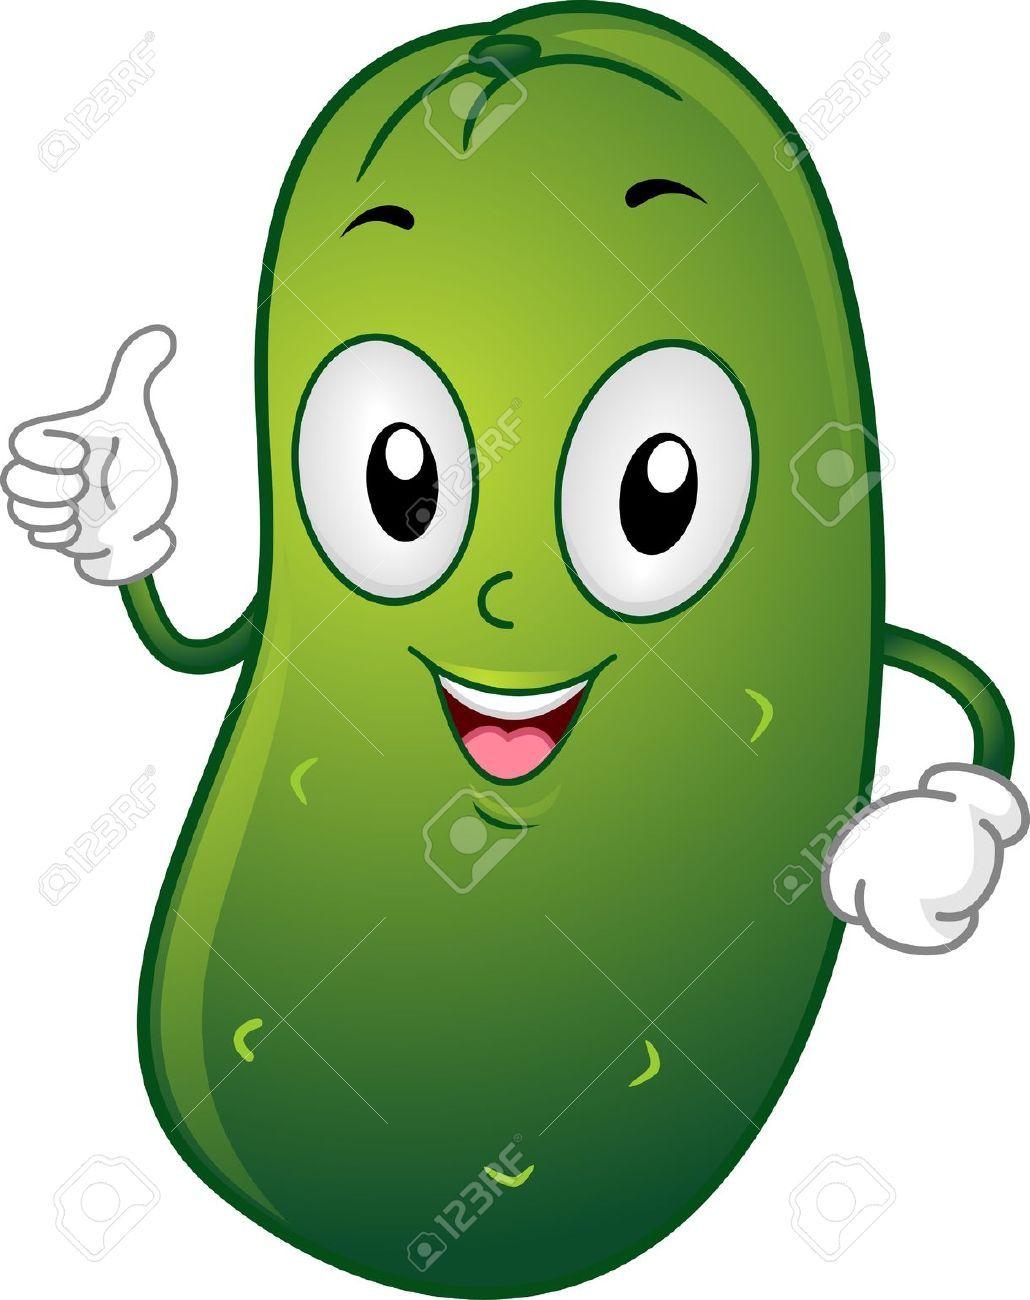 Cartoon pickle clipart 4 » Clipart Portal.